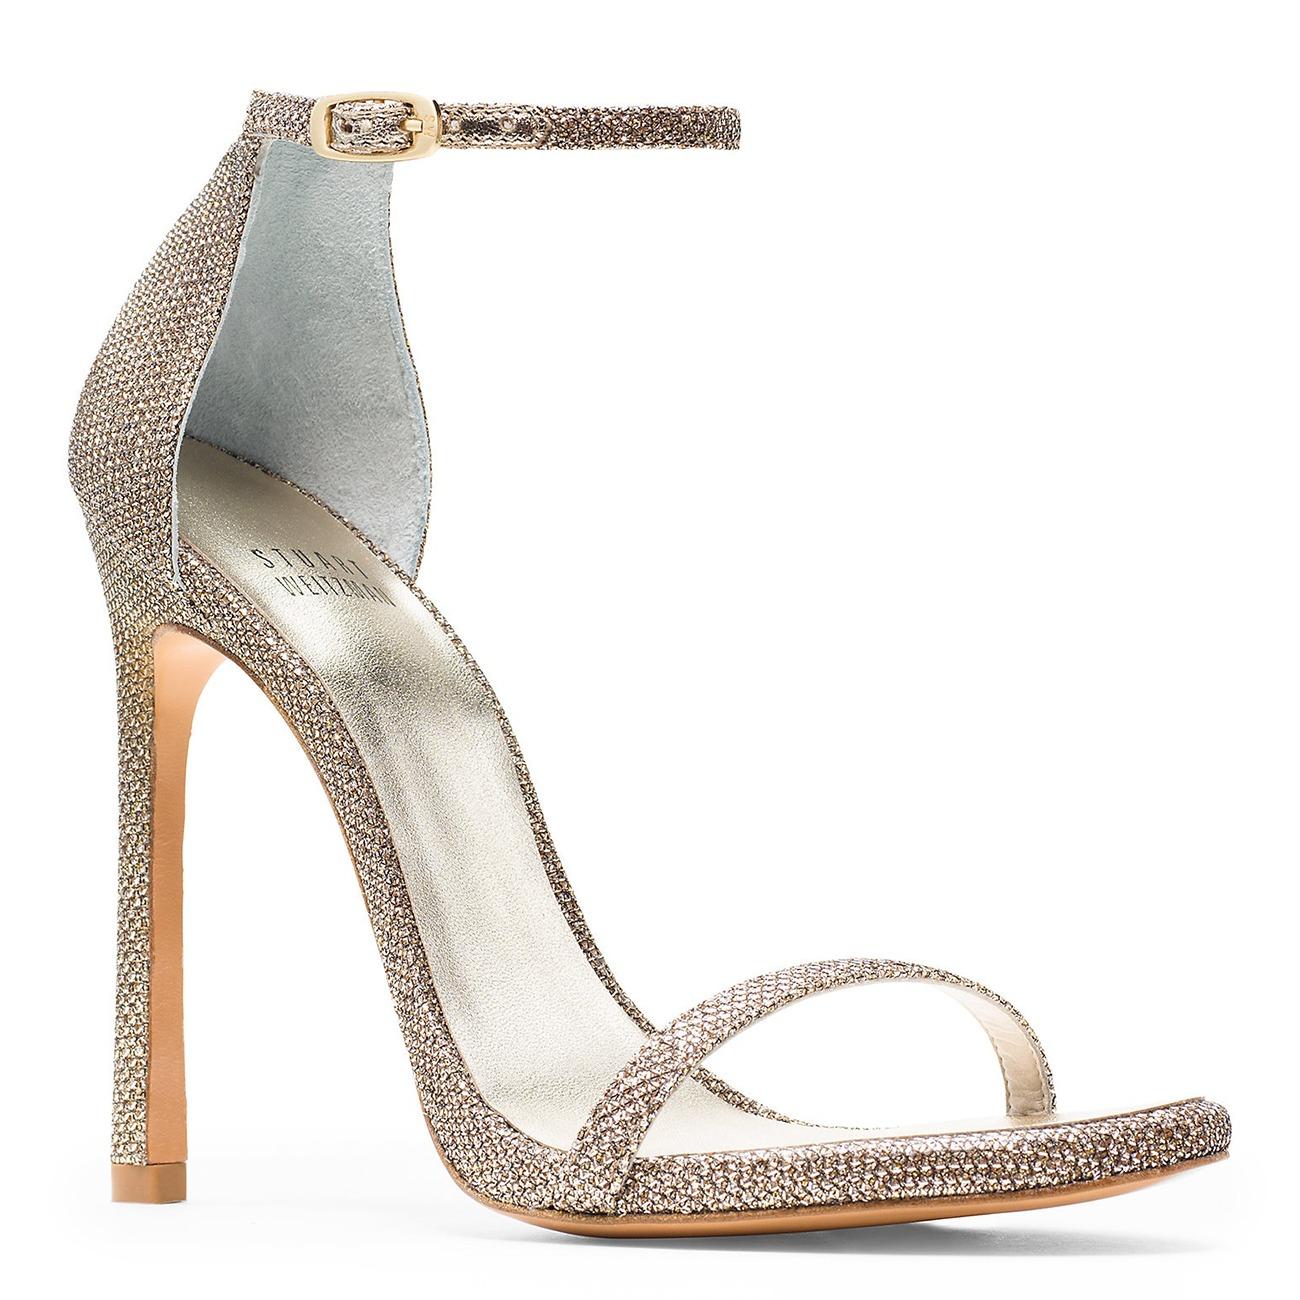 Stuart Weitzman classic Nudist wedding sandal heels